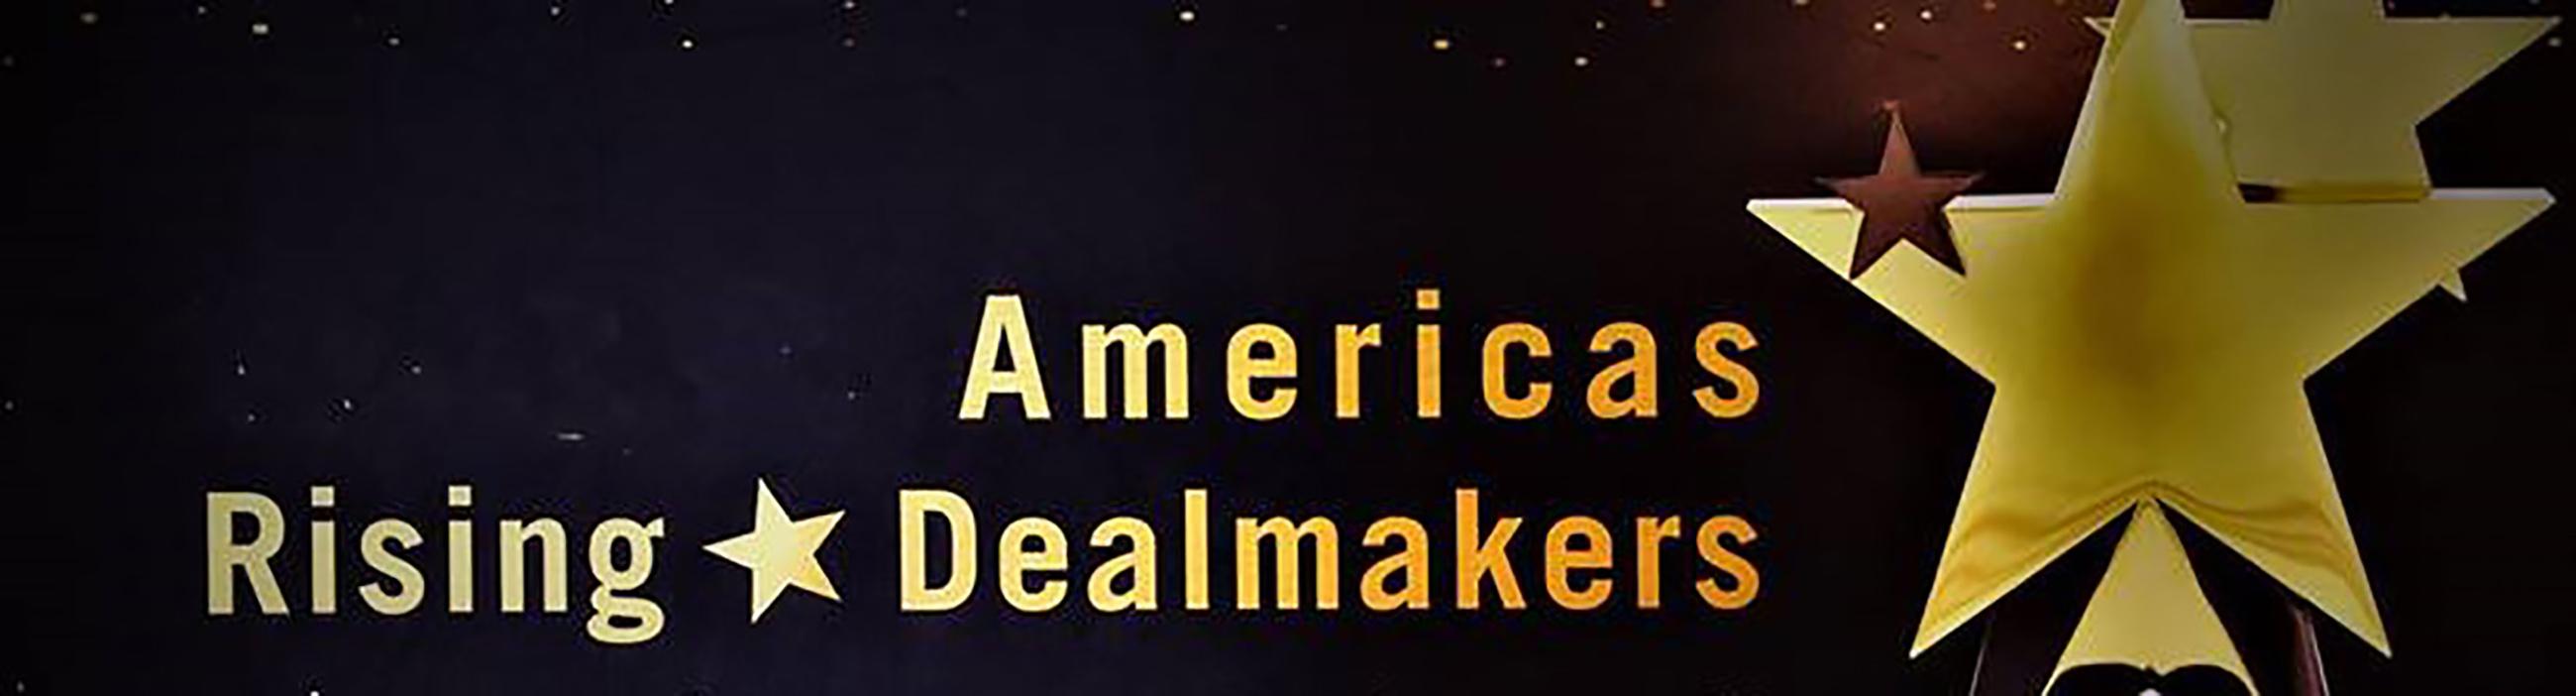 Hillary Hughes Receives M&A Atlas Americas Rising Dealmakers Award